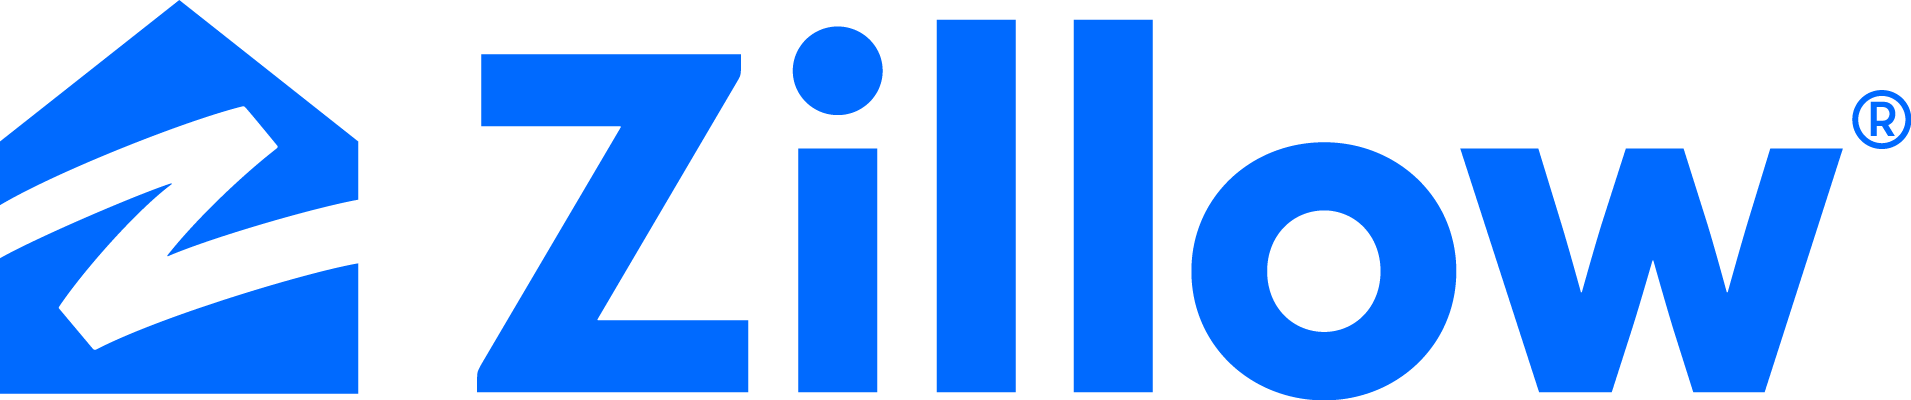 Zillow_Wordmark_Blue_RGB lrg